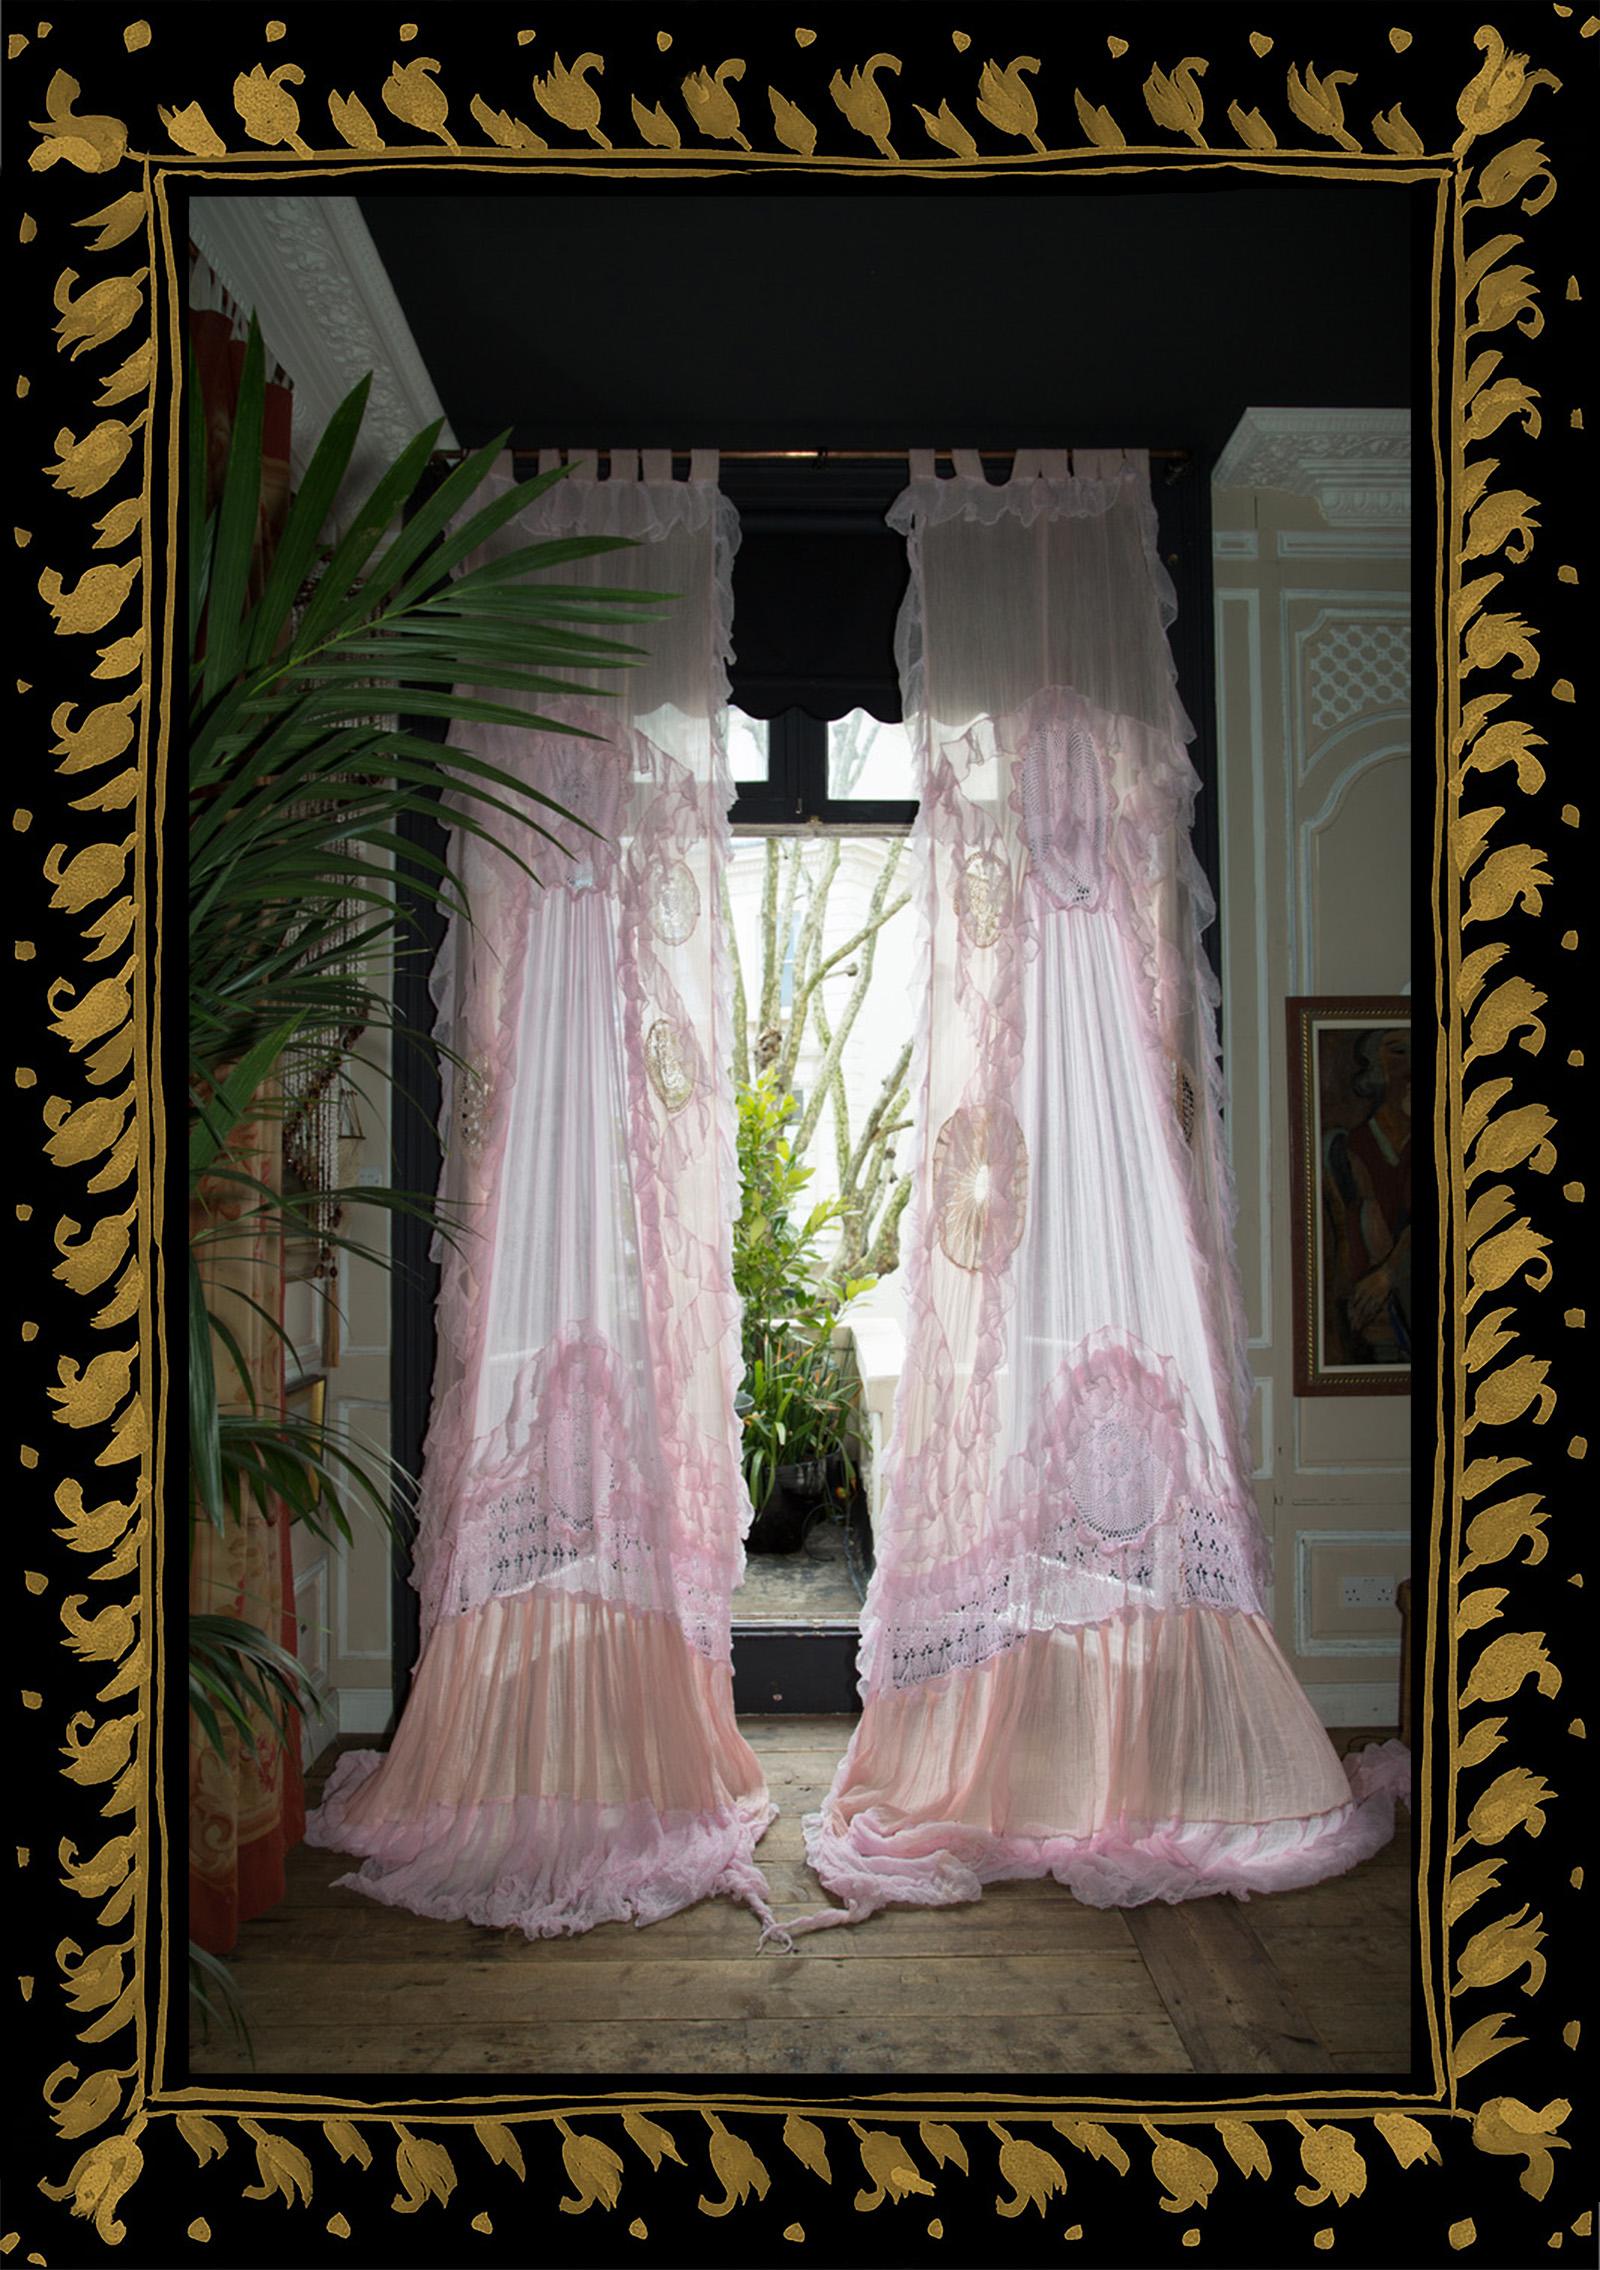 Curtain-31.jpg